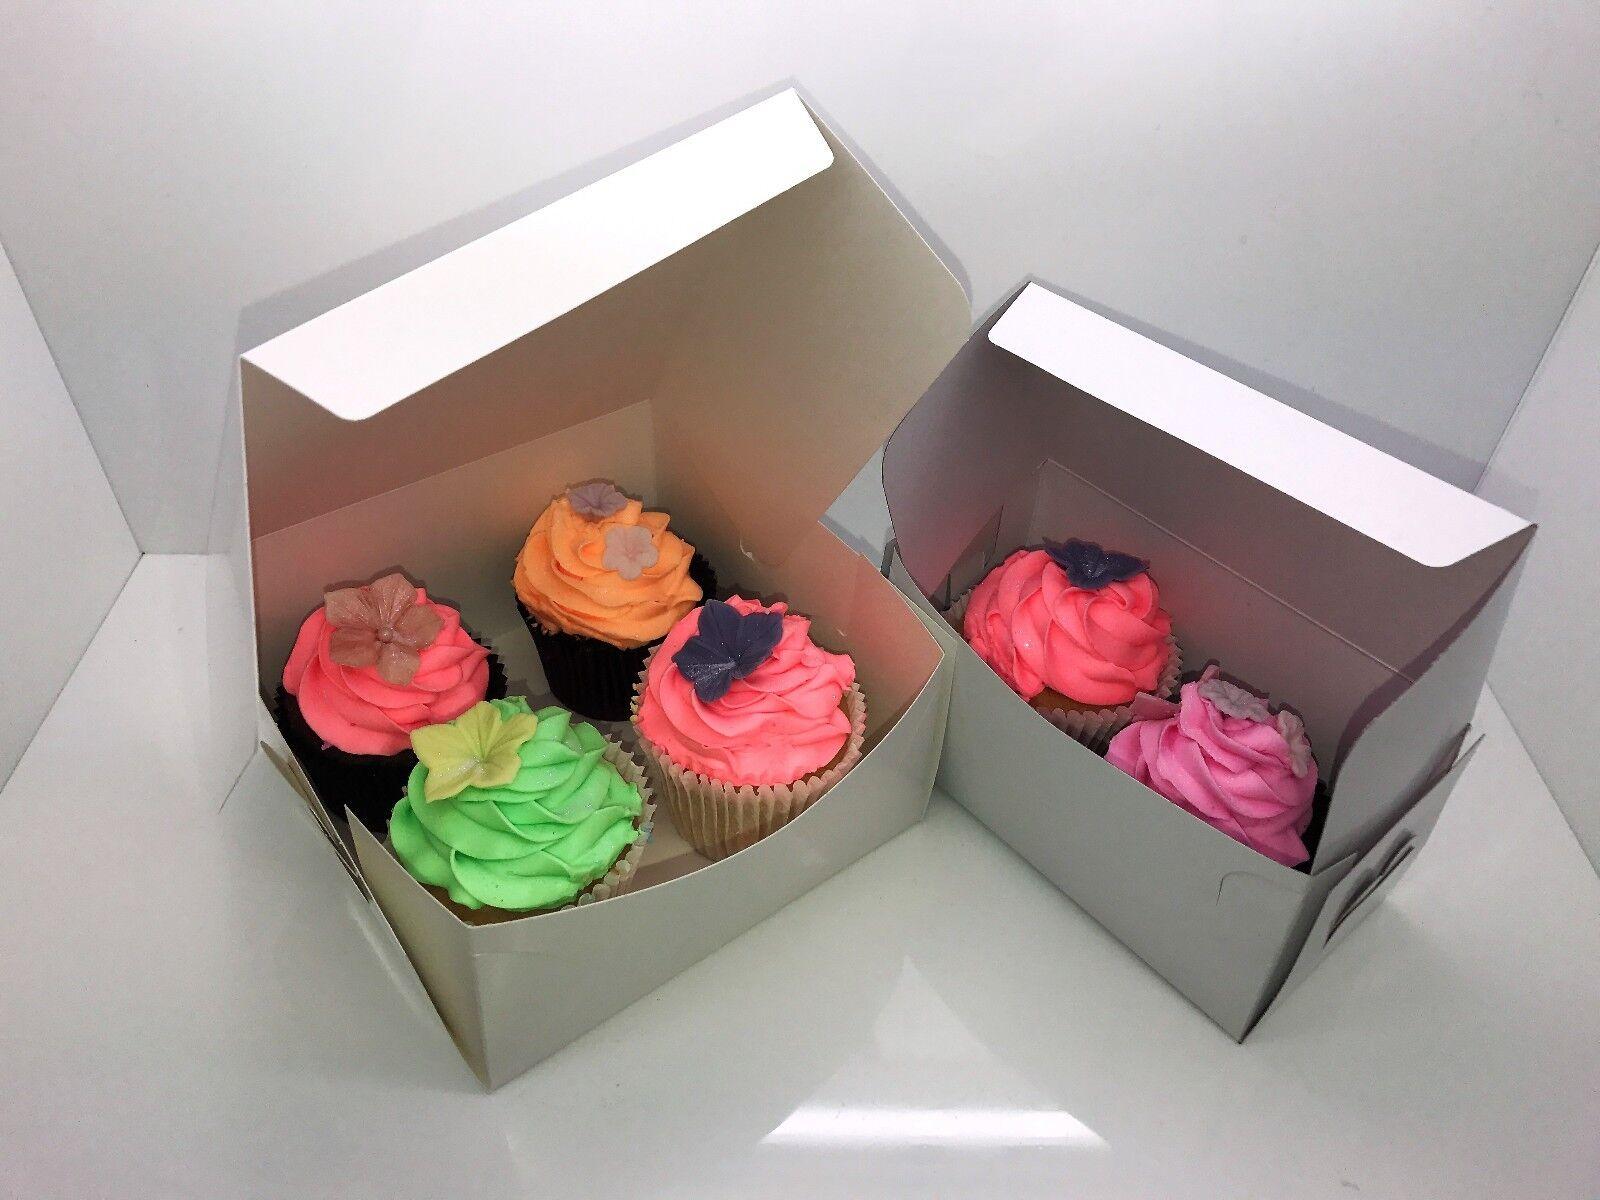 100 of Weiß Folding Cardboard Cake Box   Cupcake   Muffin Boxes 10  x 10  x 4